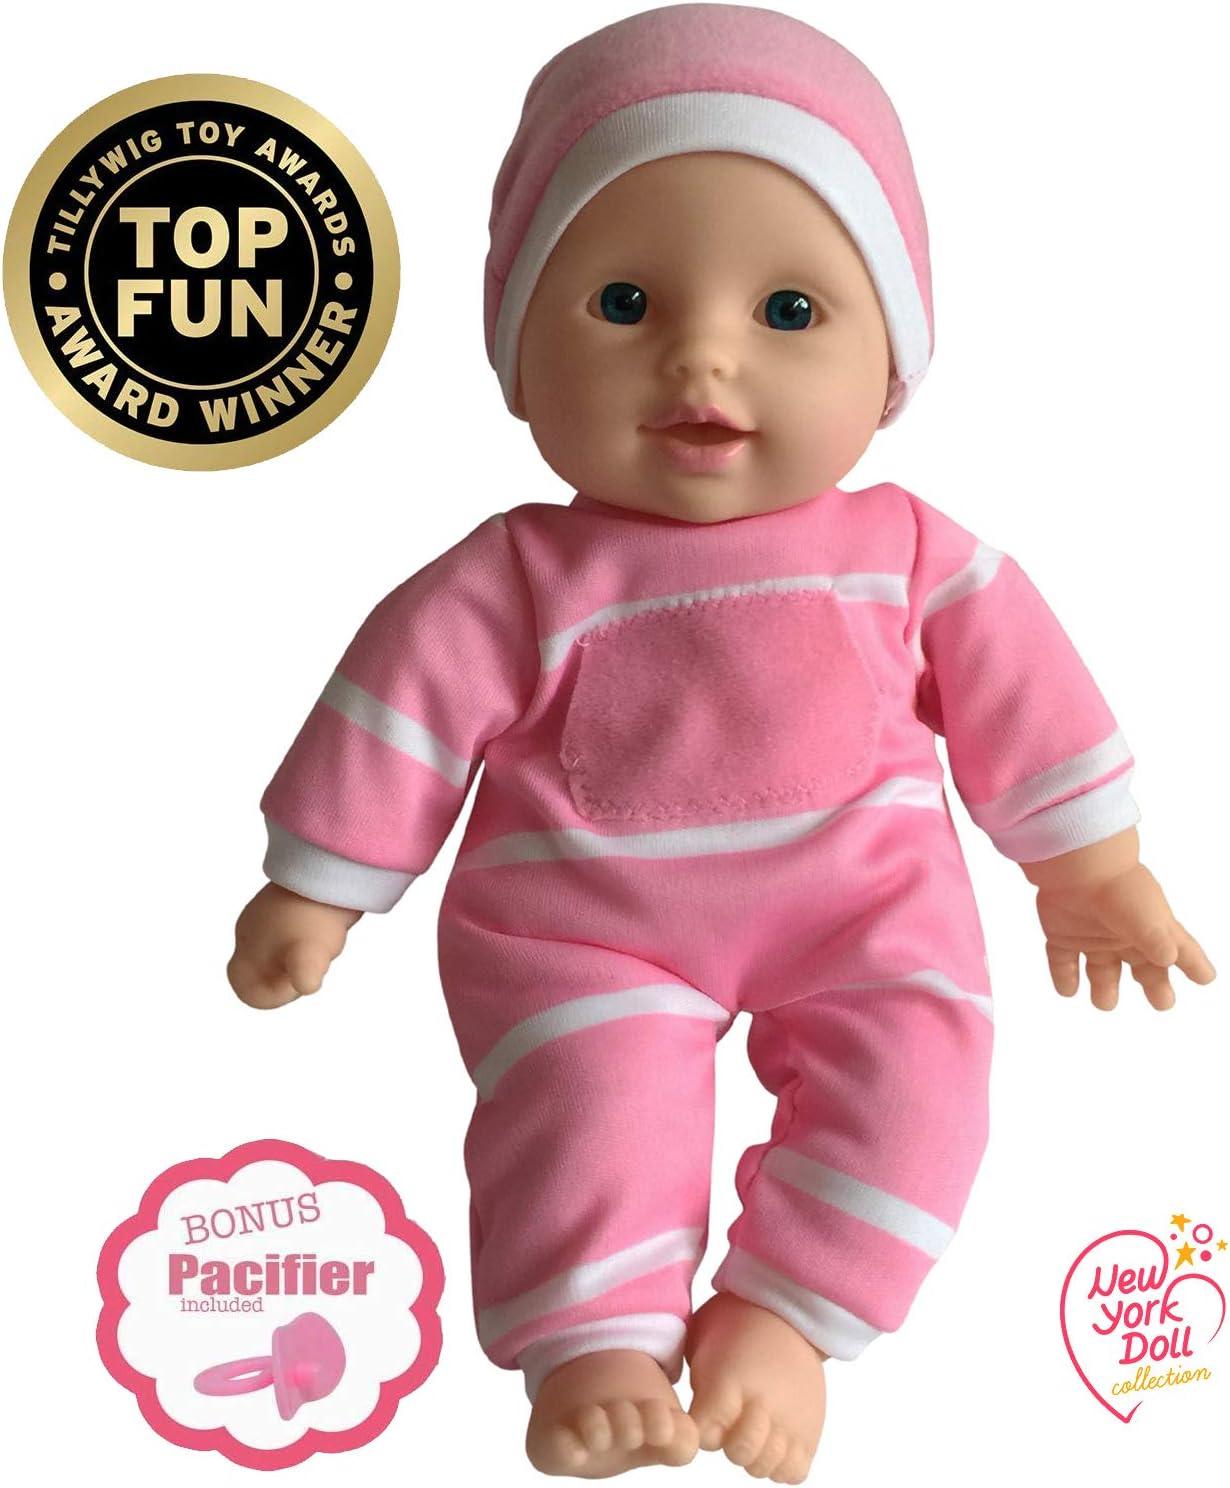 "11 inch Soft Body Doll in Gift Box - Award Winner & Toy 11"" Baby Doll (Caucasian) 71CzUZO2BcqL"